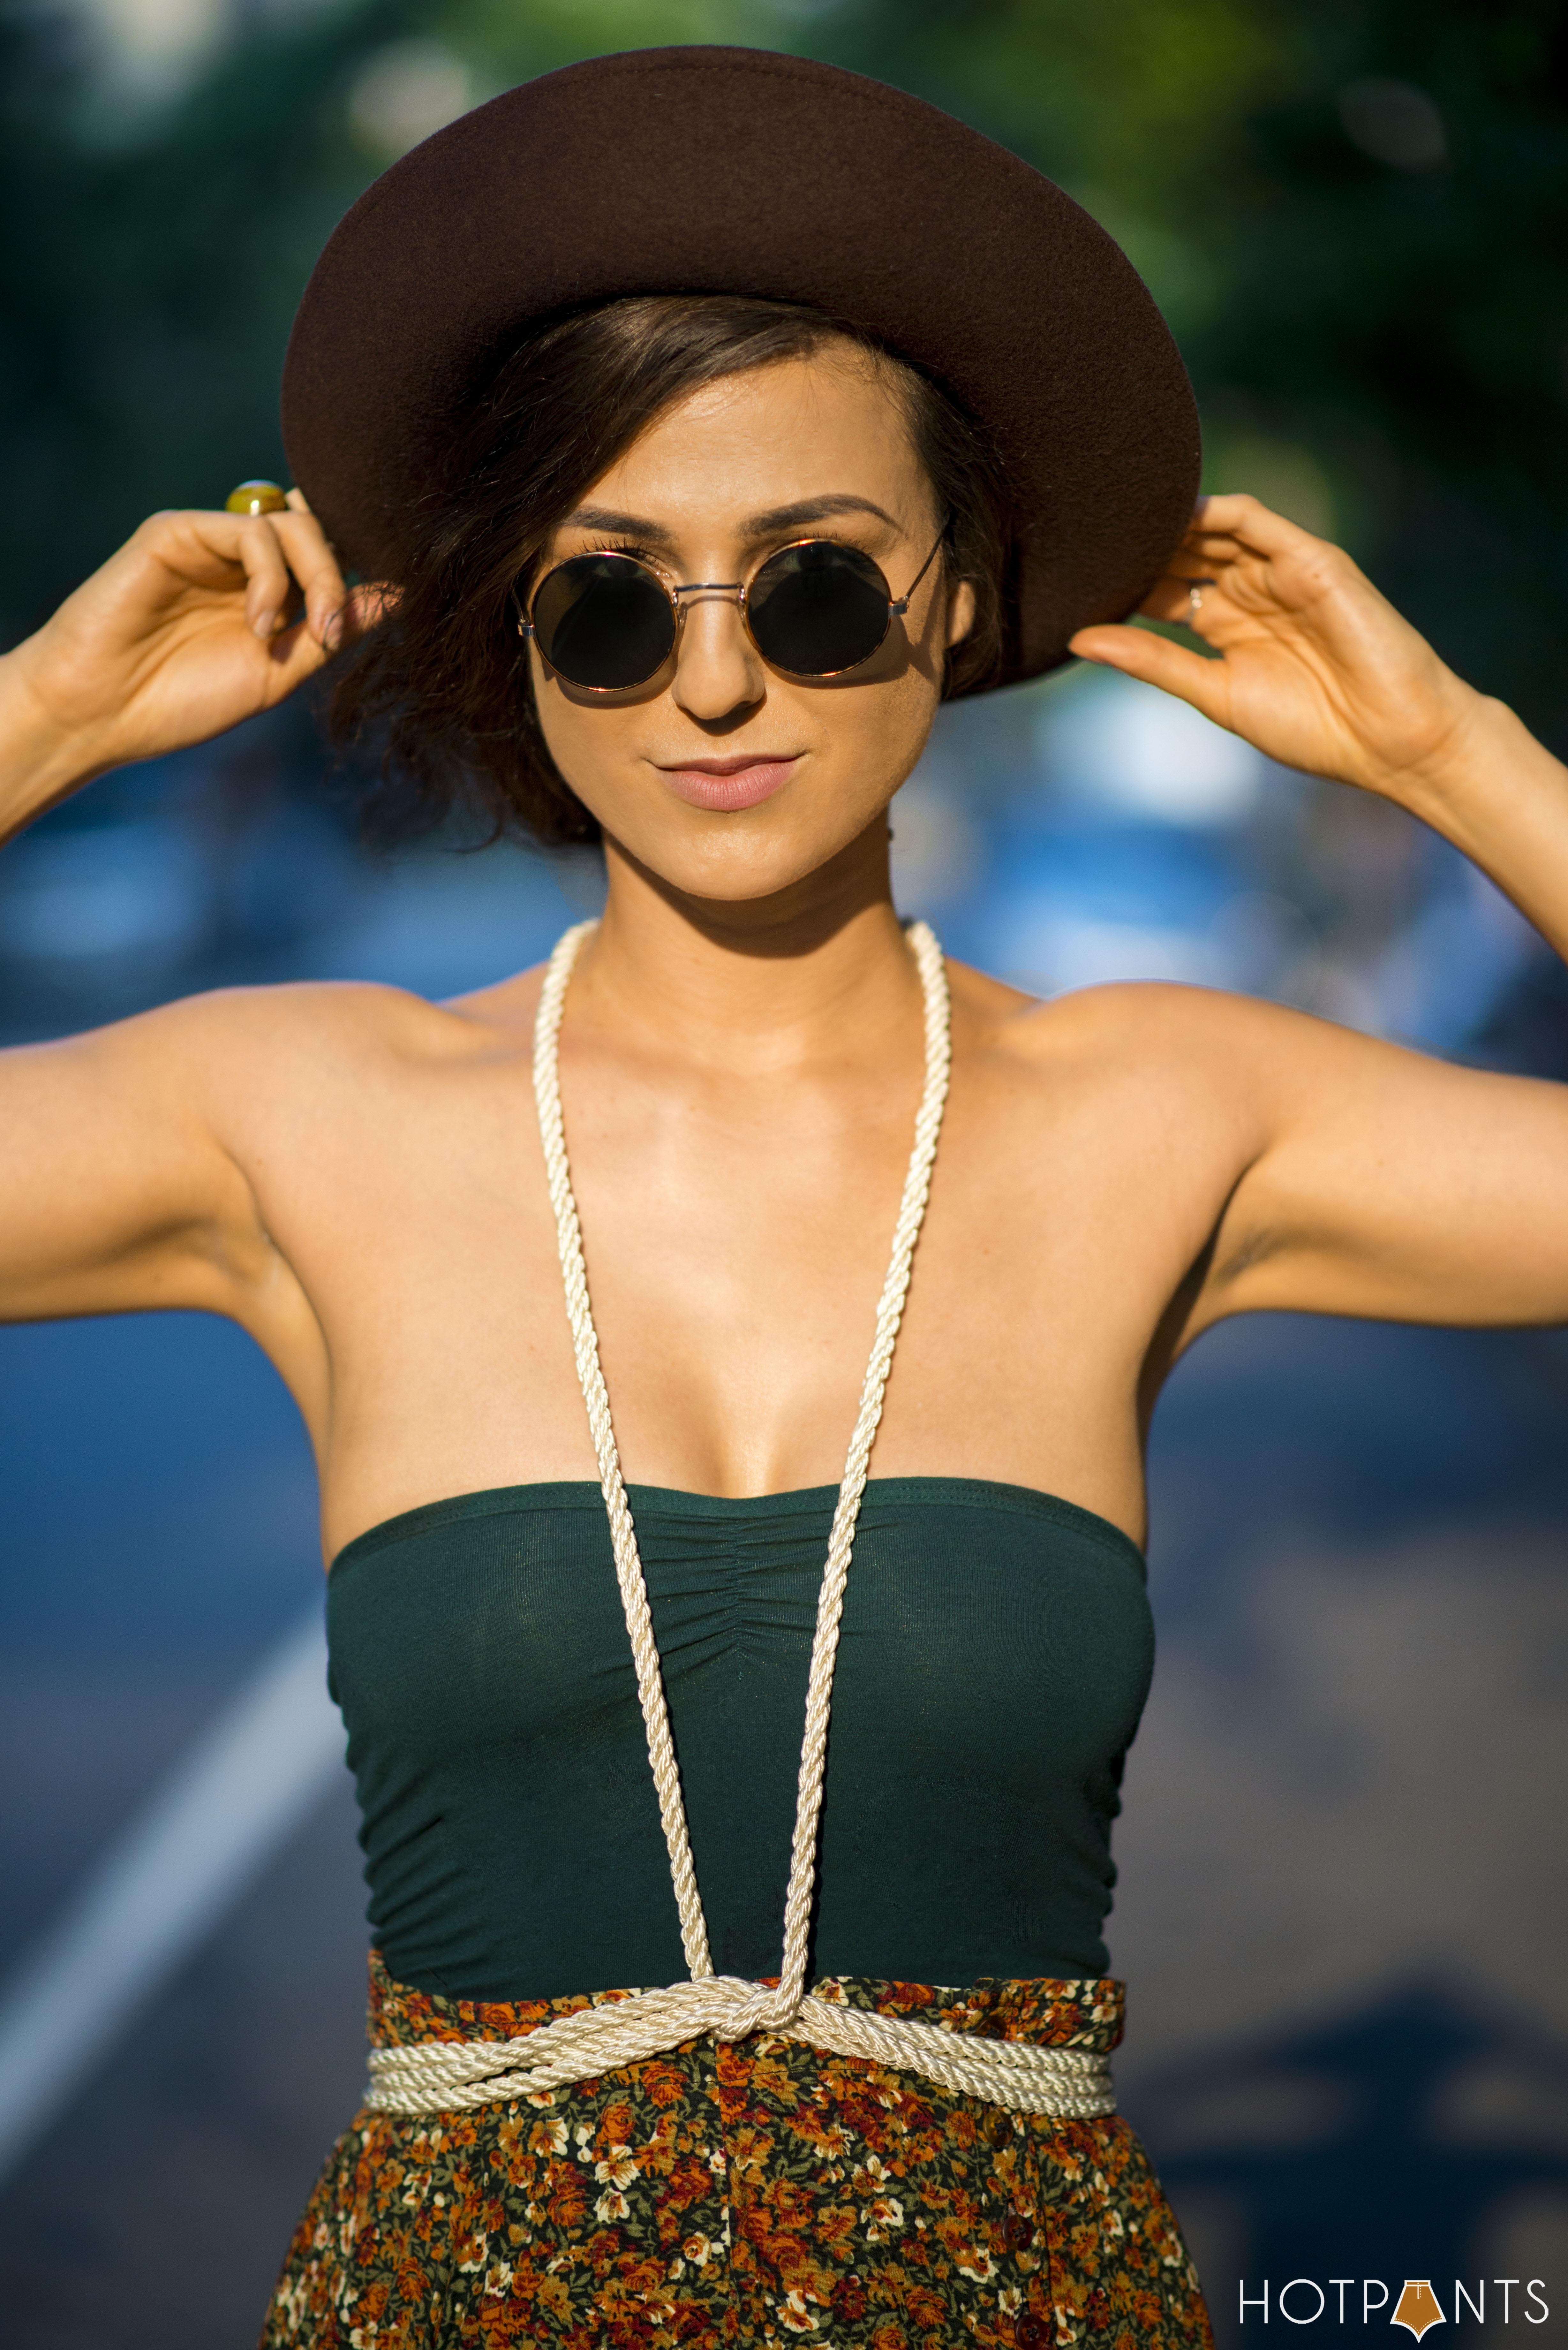 Rope Harness John Lennon Sunglasses Wide Brim Hat Summer Streetstyle